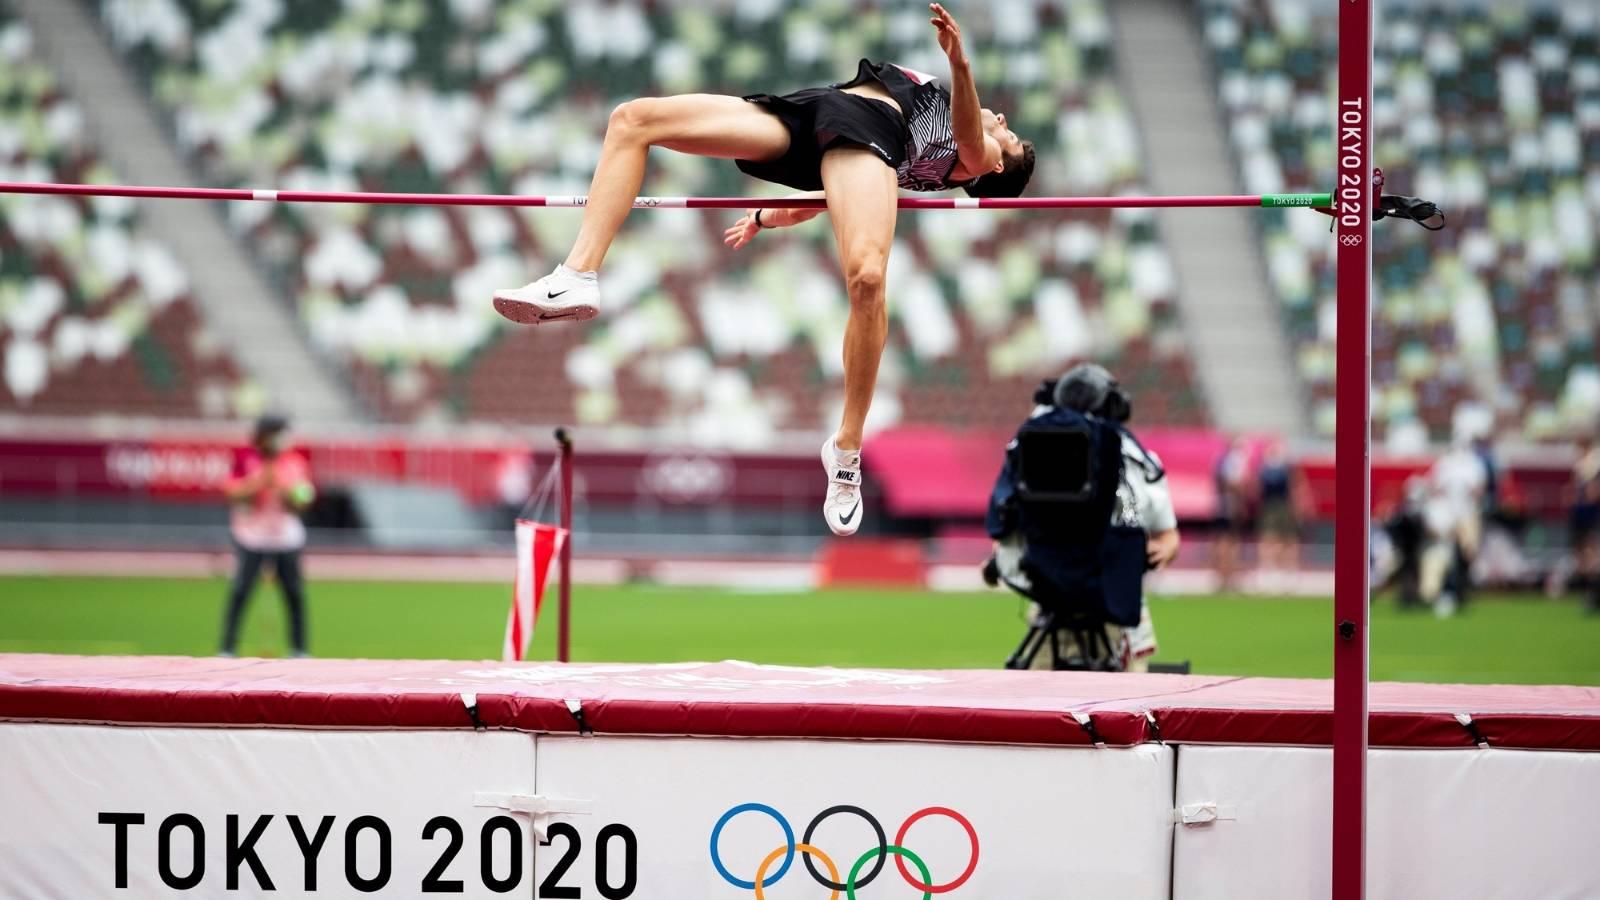 Tokyo Olympics: The Kiwis to watch on Sunday